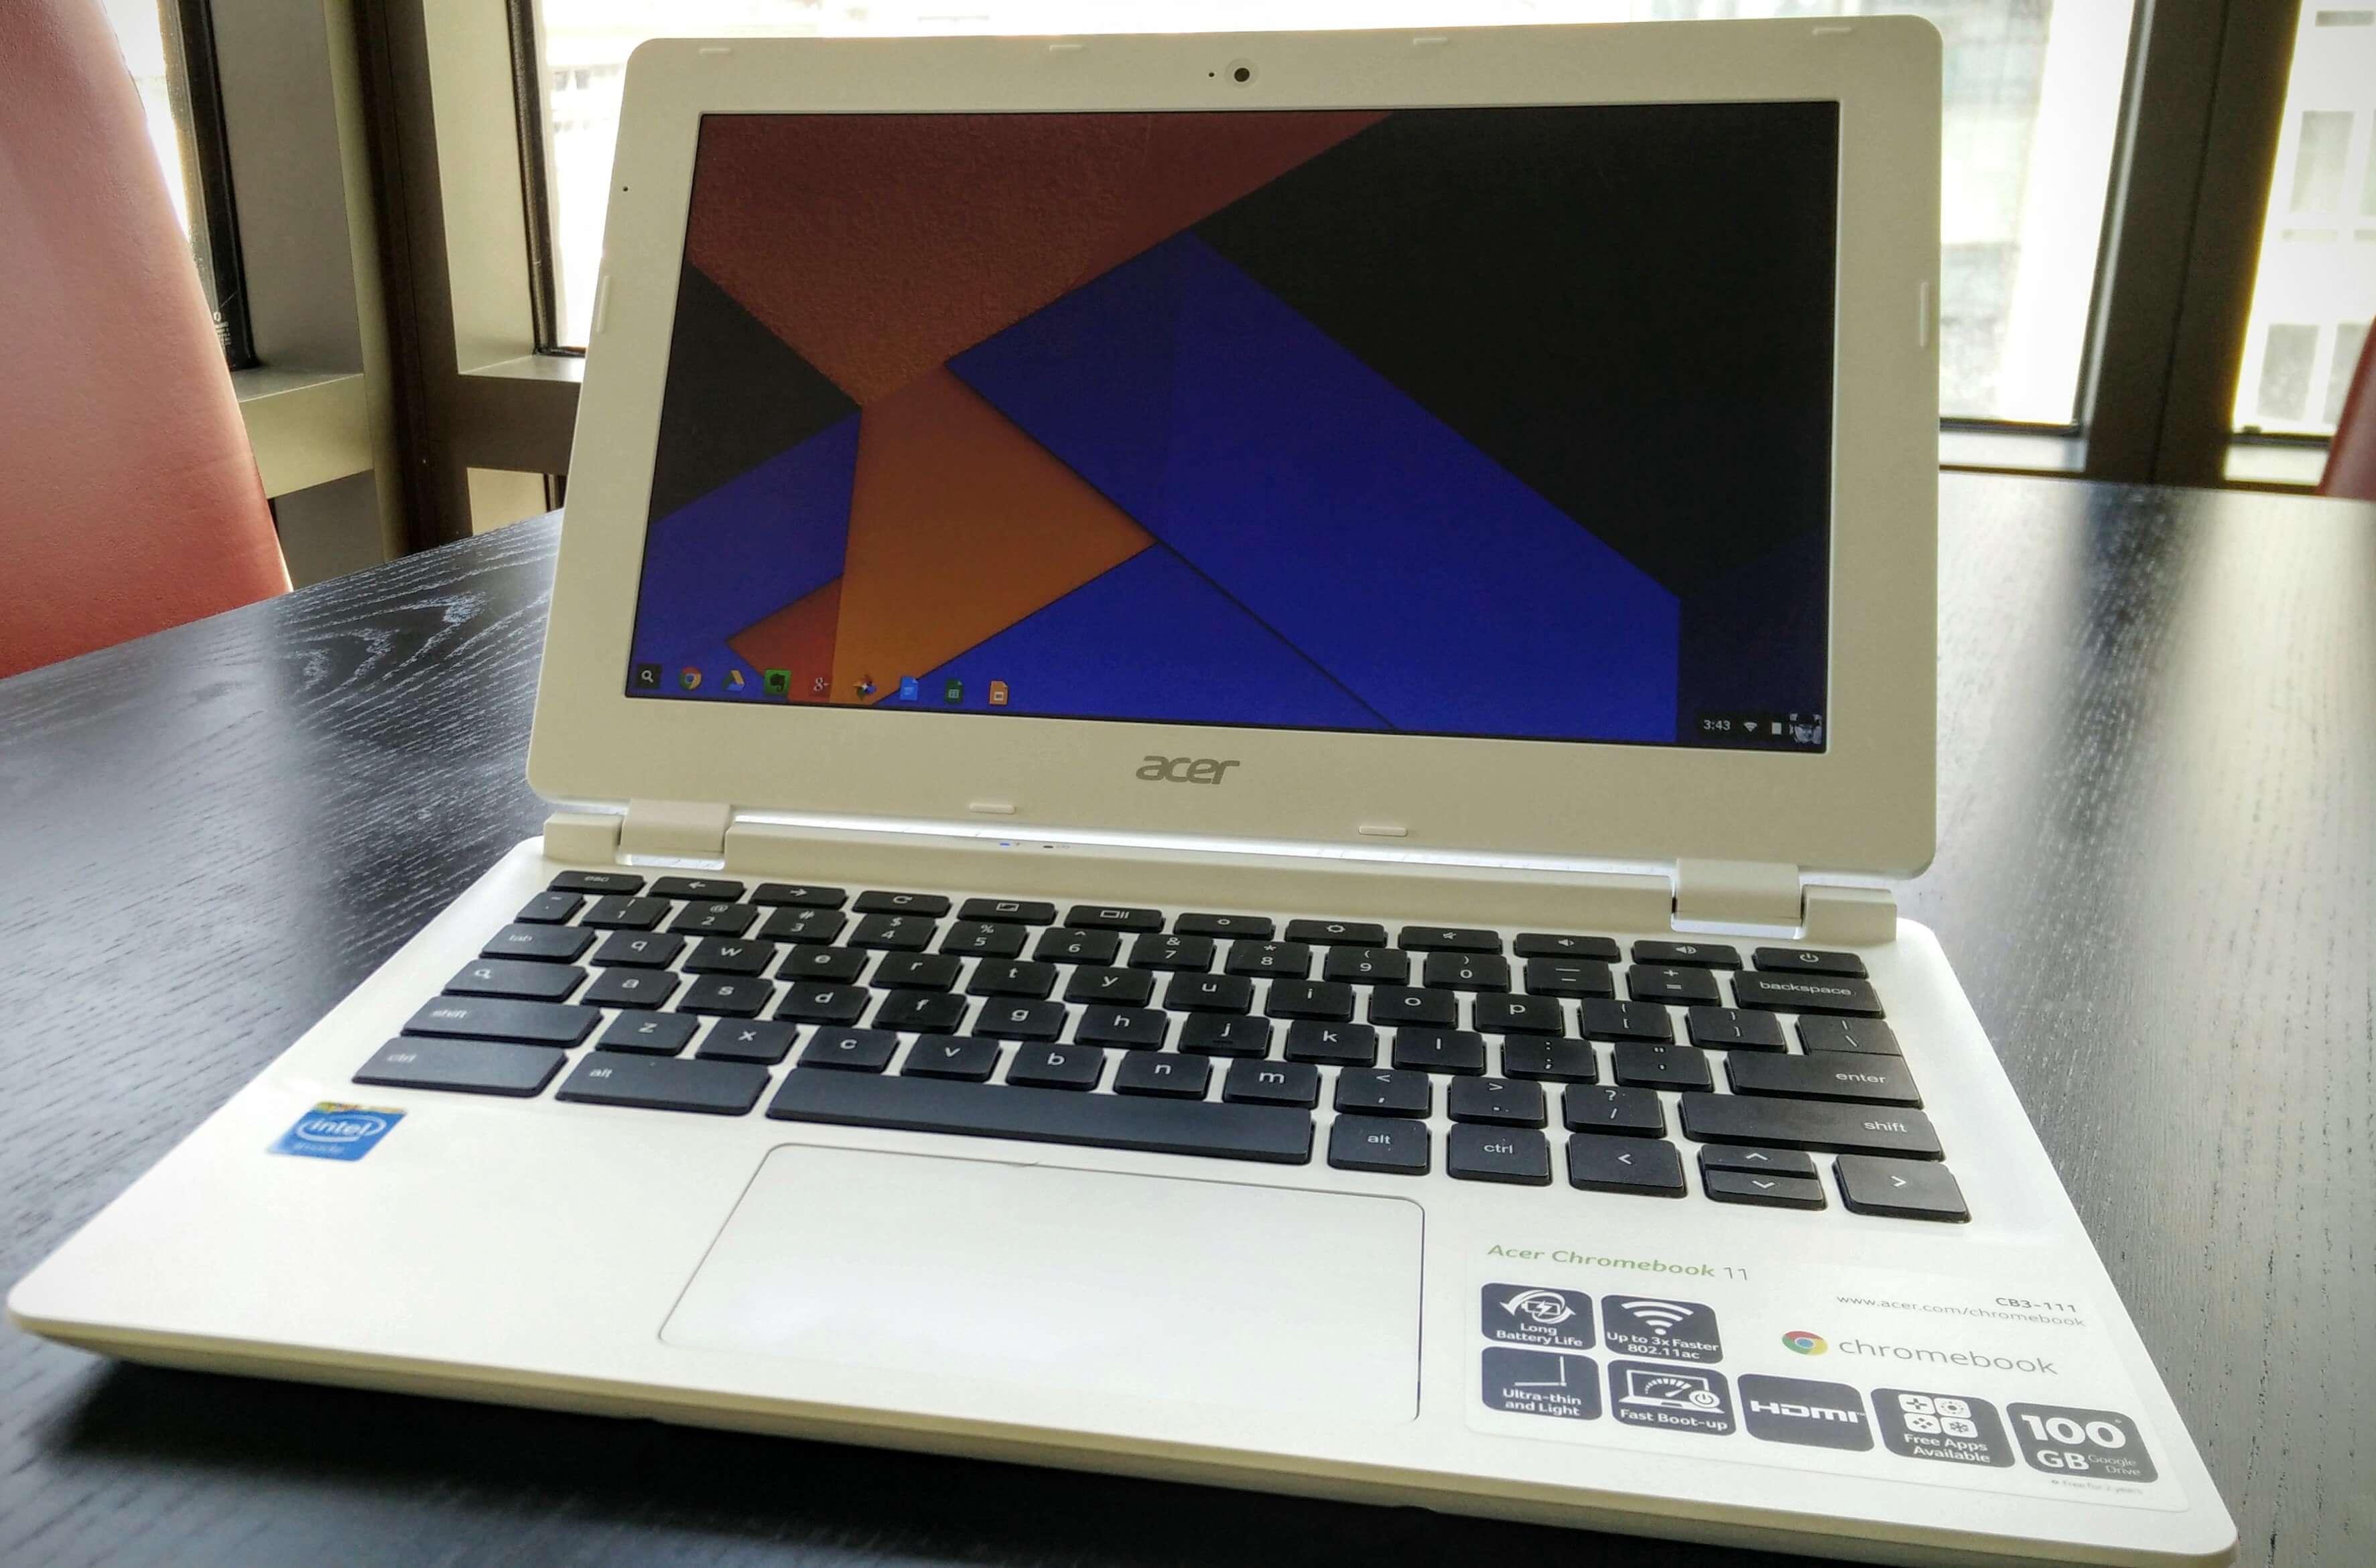 Acer C670 Chromebook